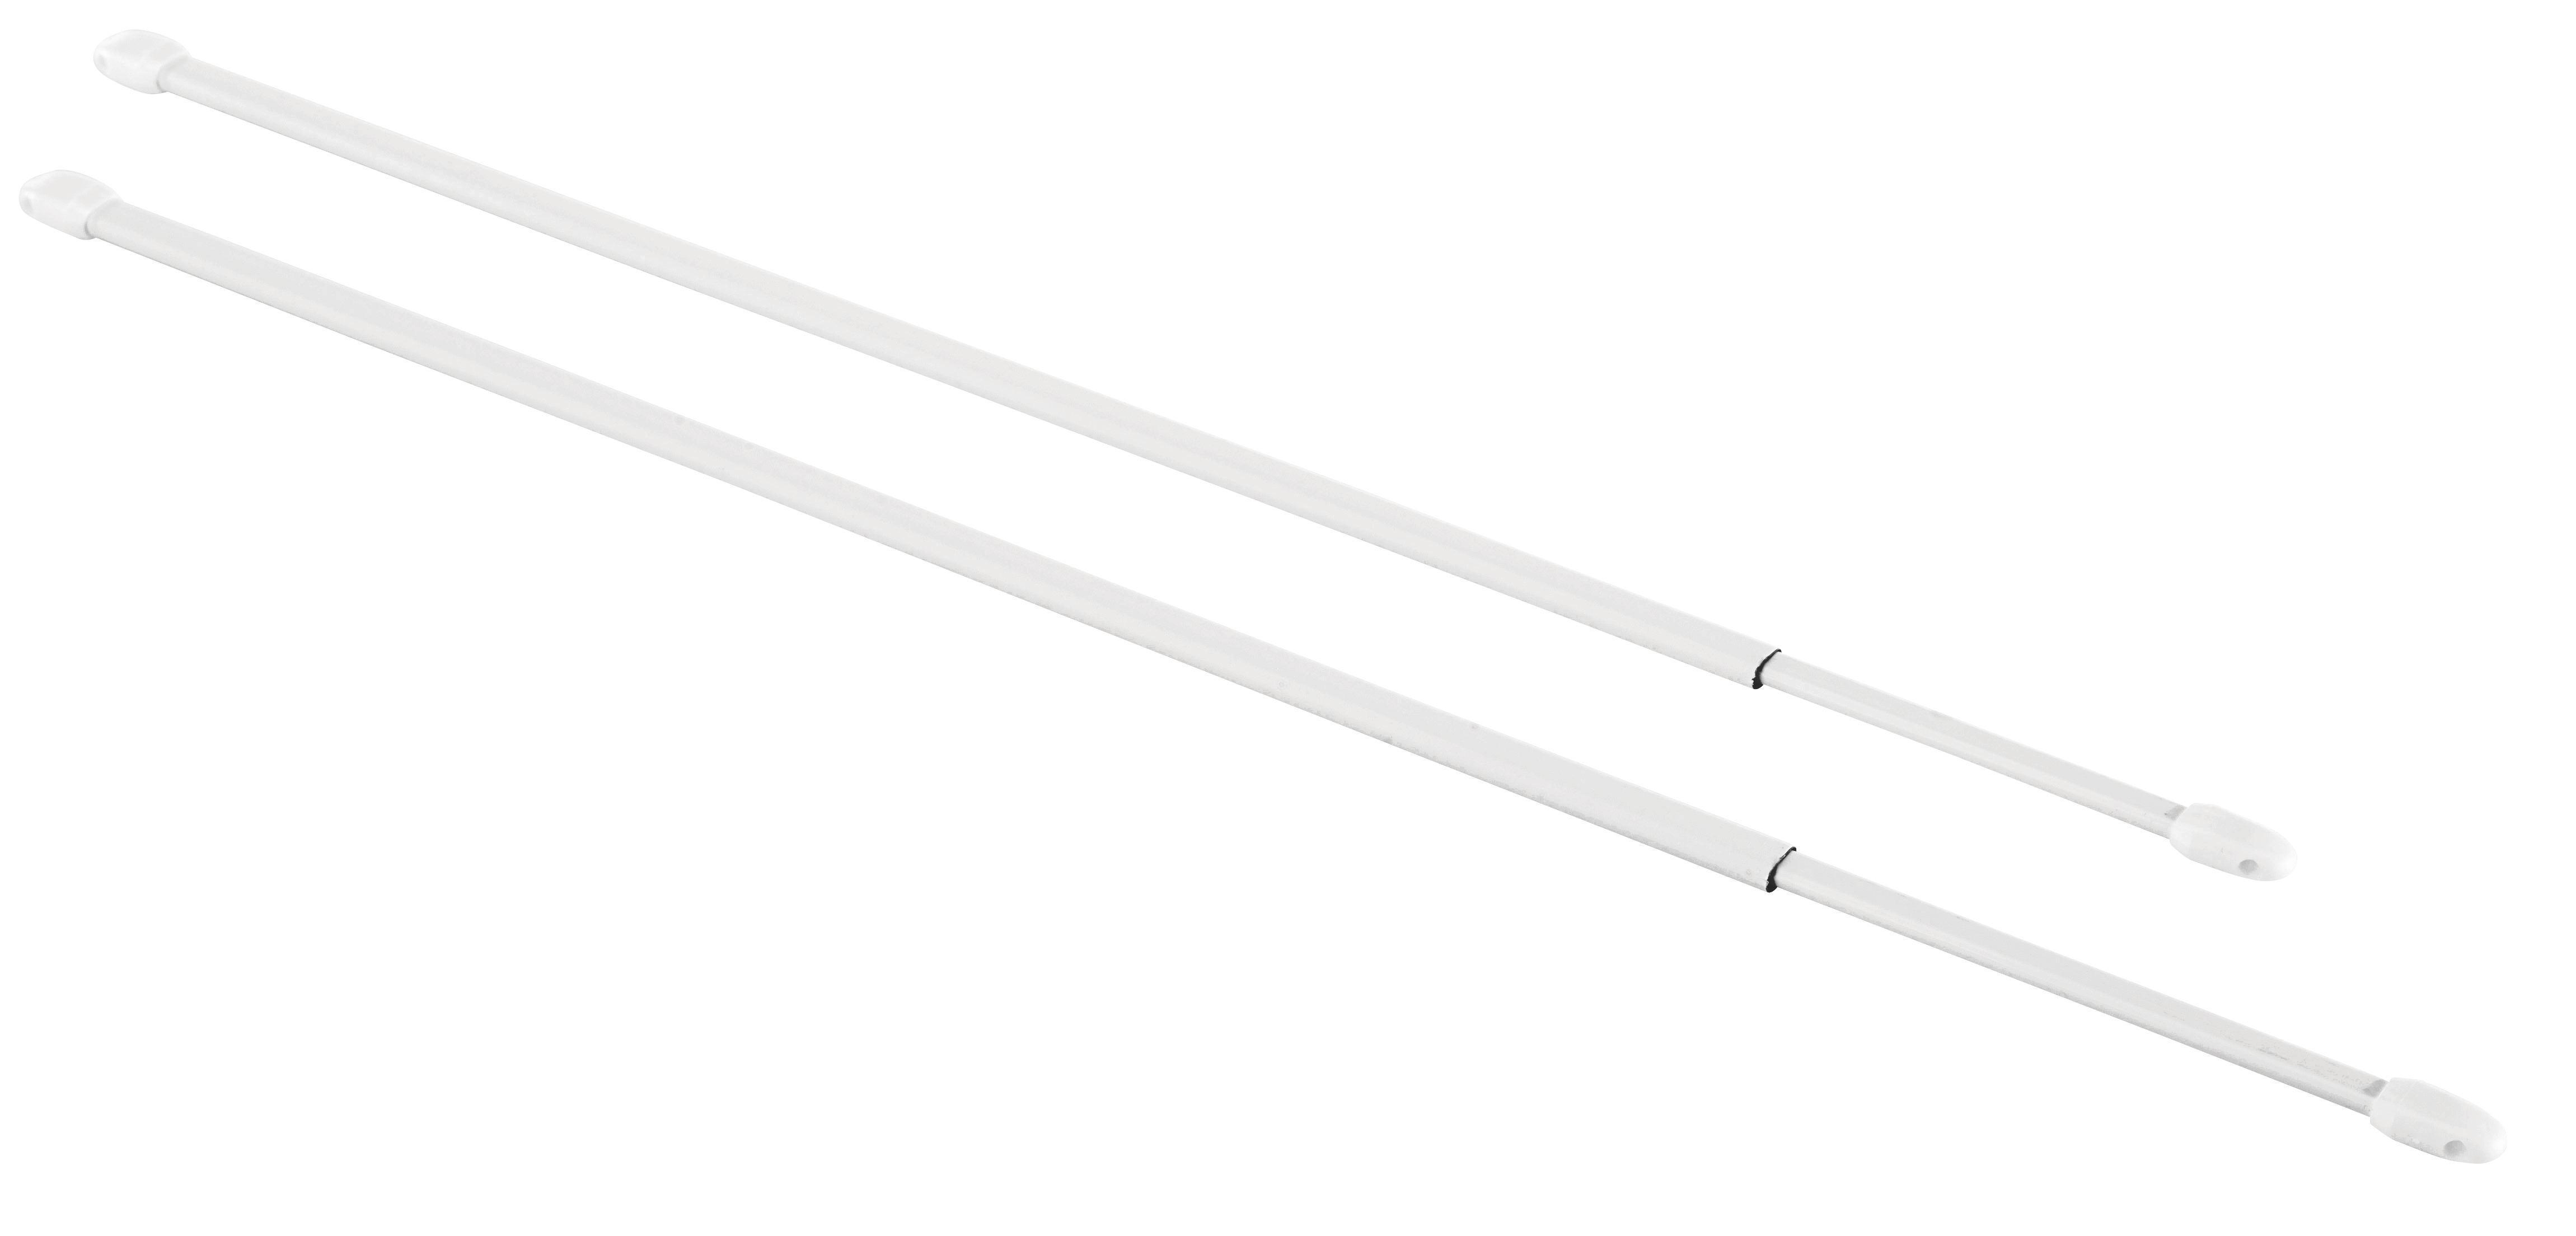 Vitragenstange Simple in Weiß, ca. 80-150cm - Weiß, Kunststoff (80-150cm) - MÖMAX modern living